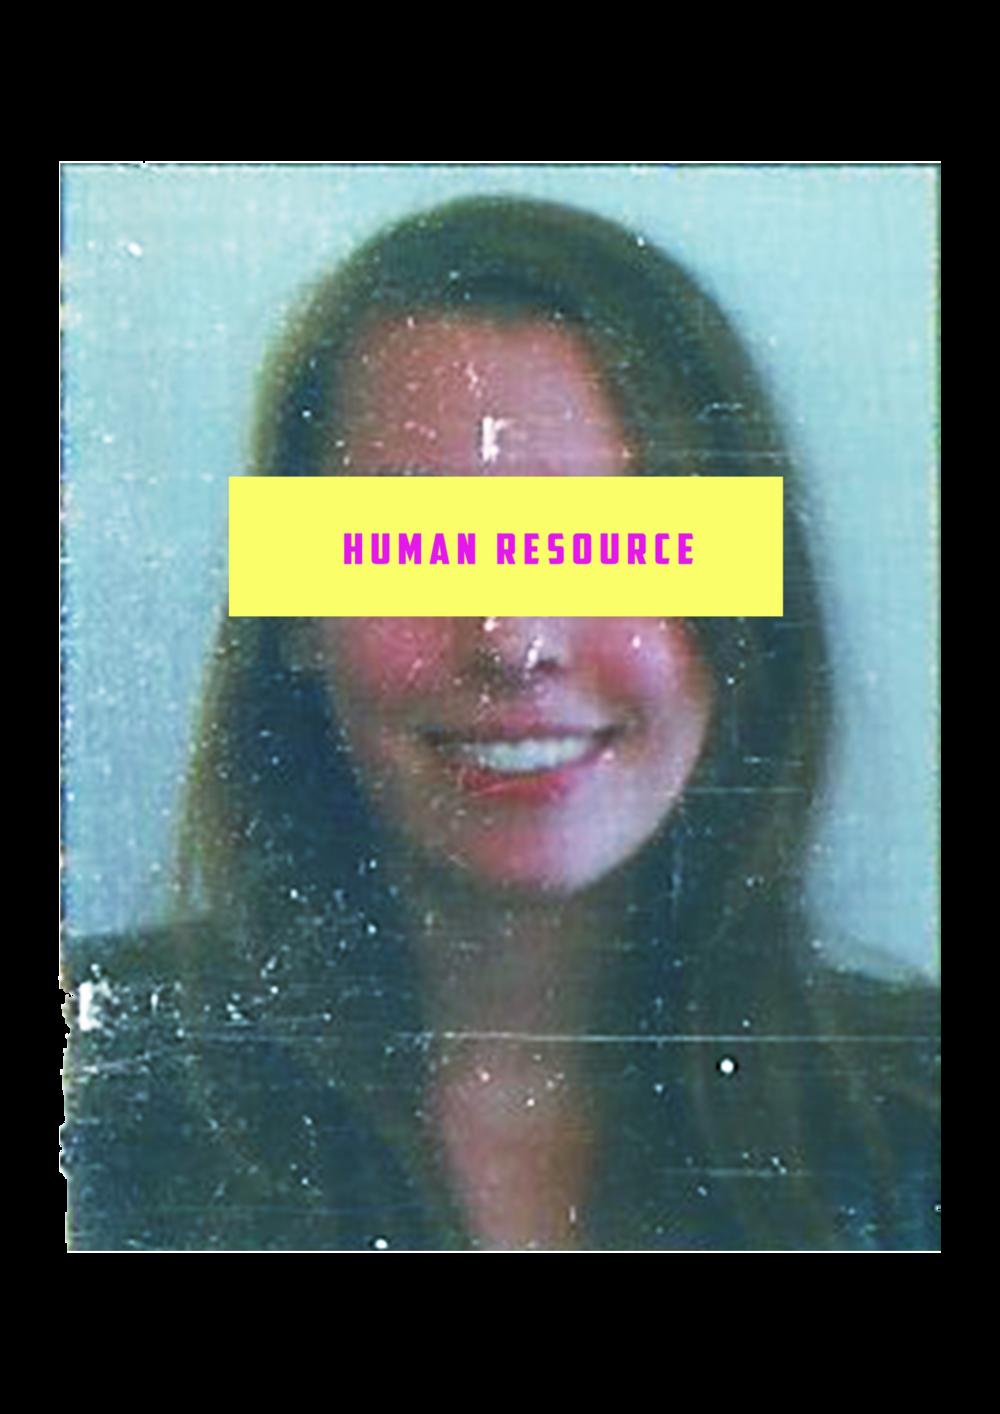 human resource_idpic.png